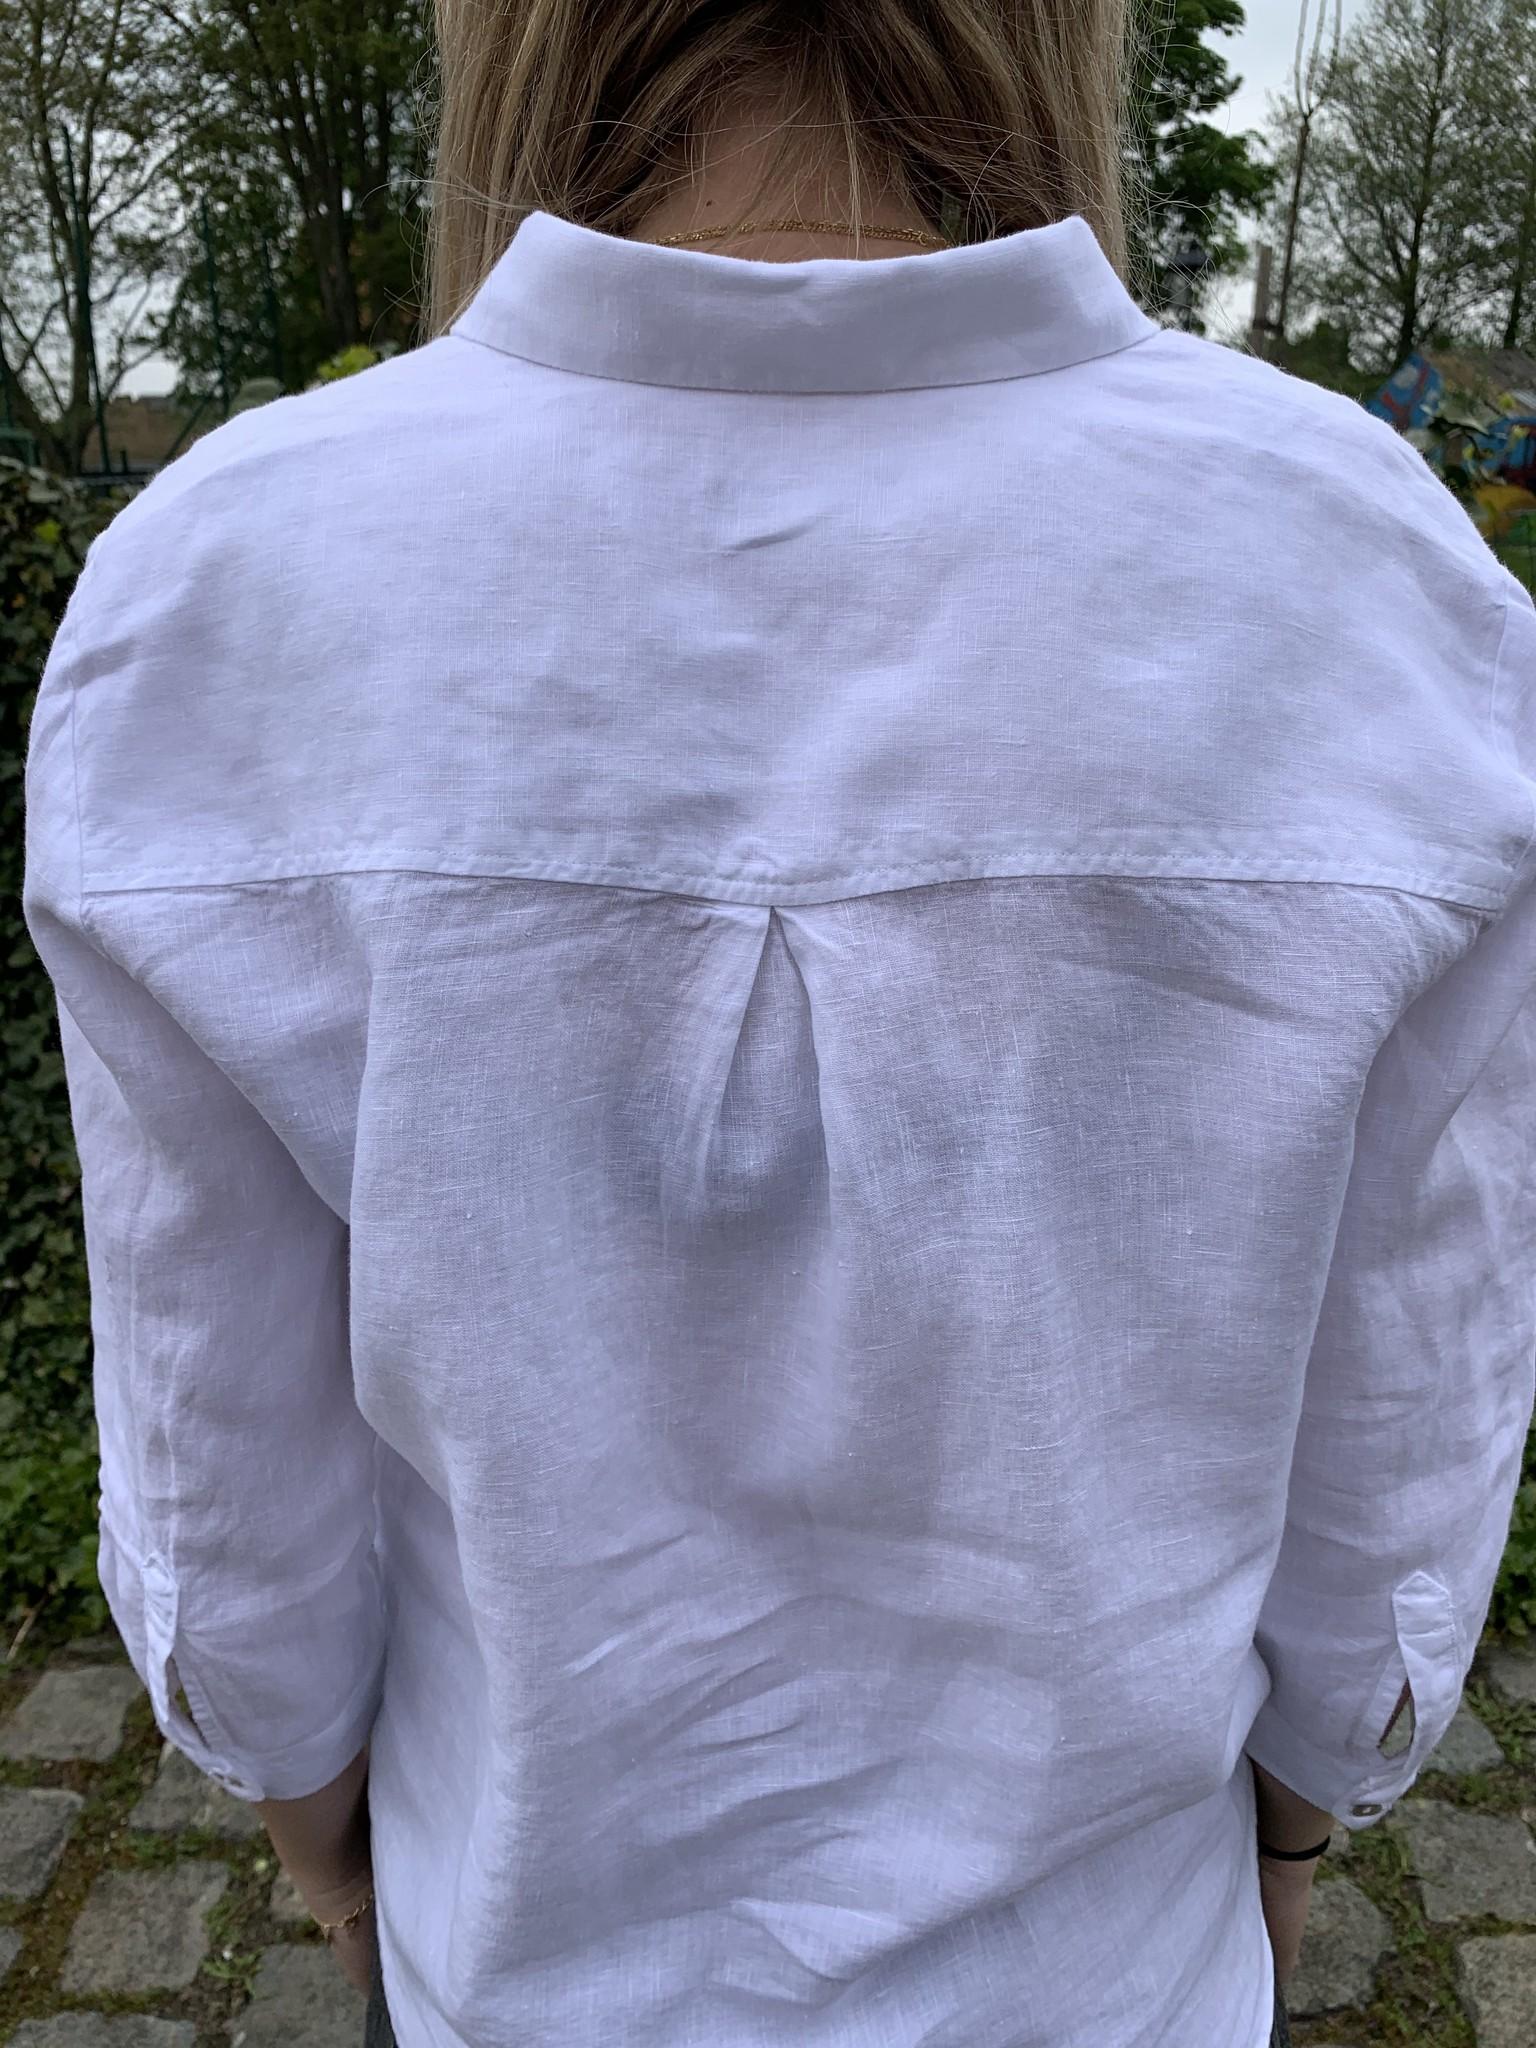 Zuiver linnen blouse met 3/4 mouwen wit